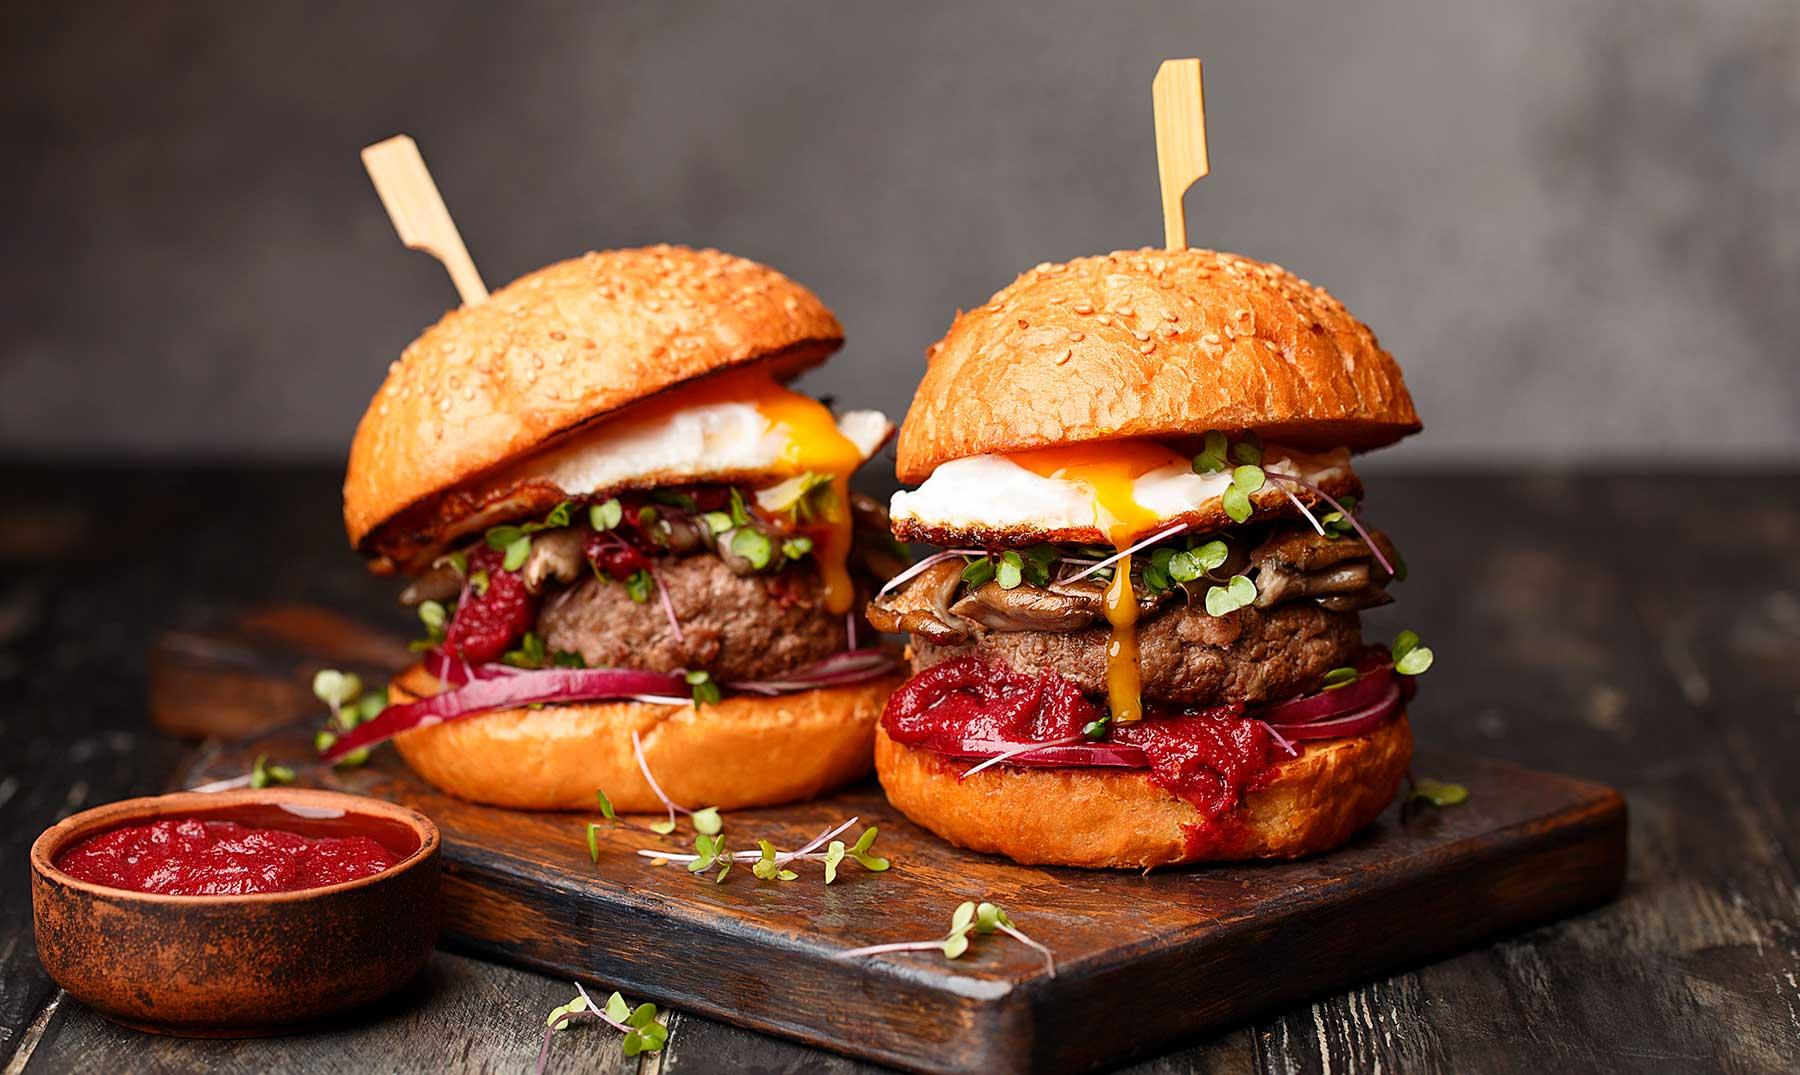 Dos hamburguesas sobre una tabla